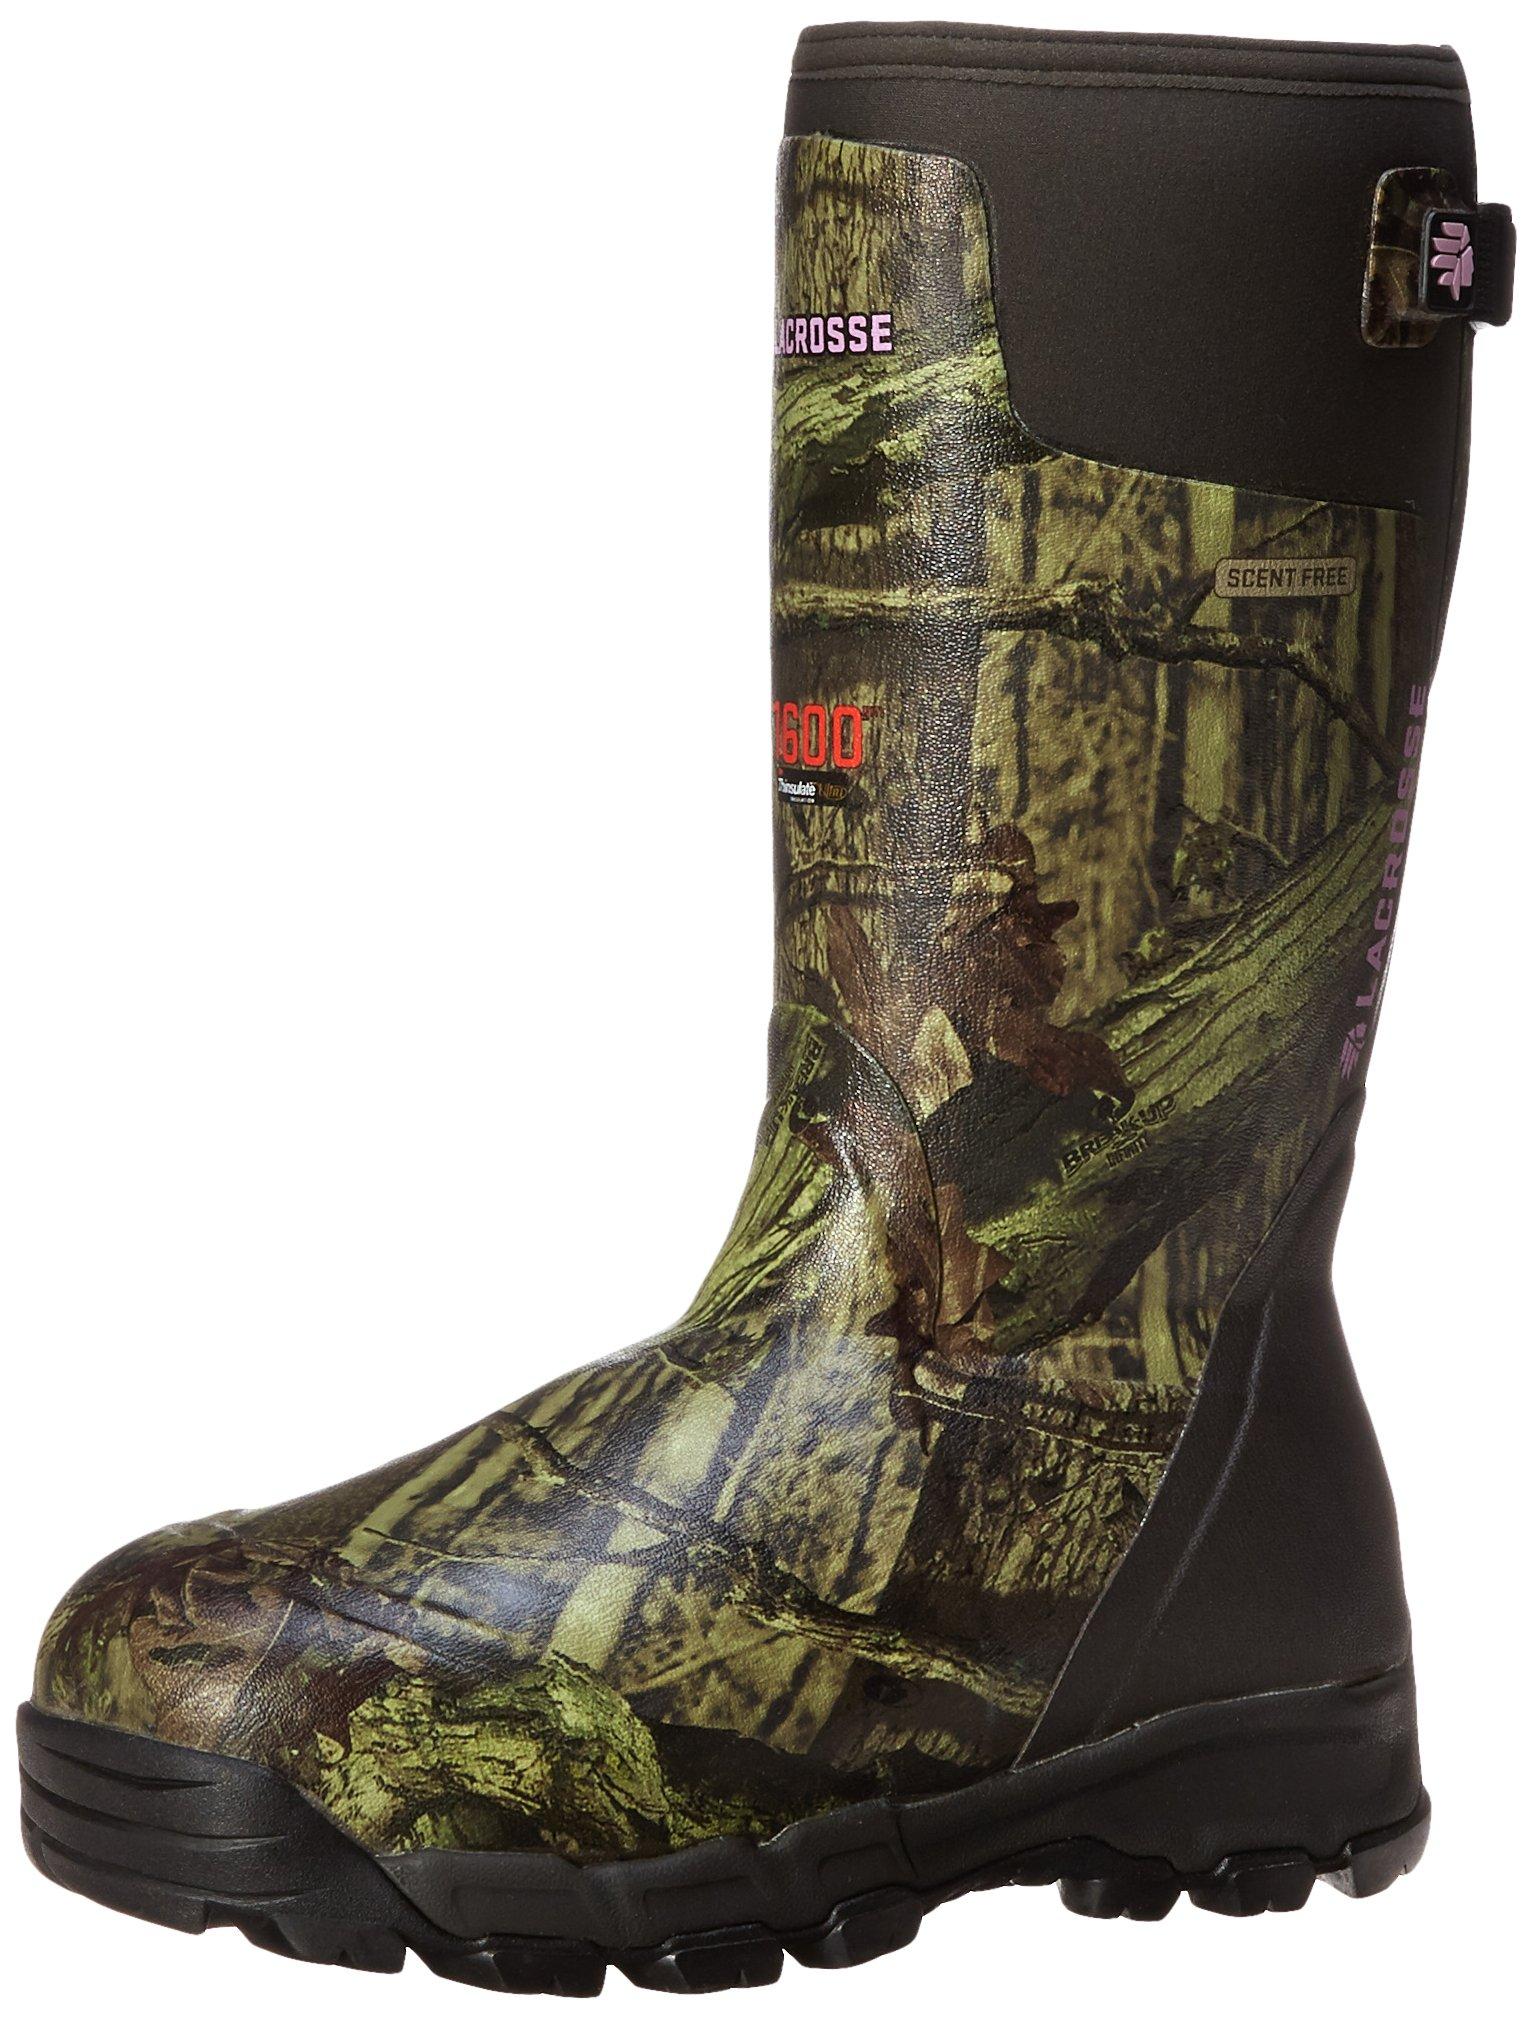 LaCrosse Women's Alphaburly Pro 15 Mo 1600G Hunting Boot,Mossy Oak Break-Up Infinity,7 M US